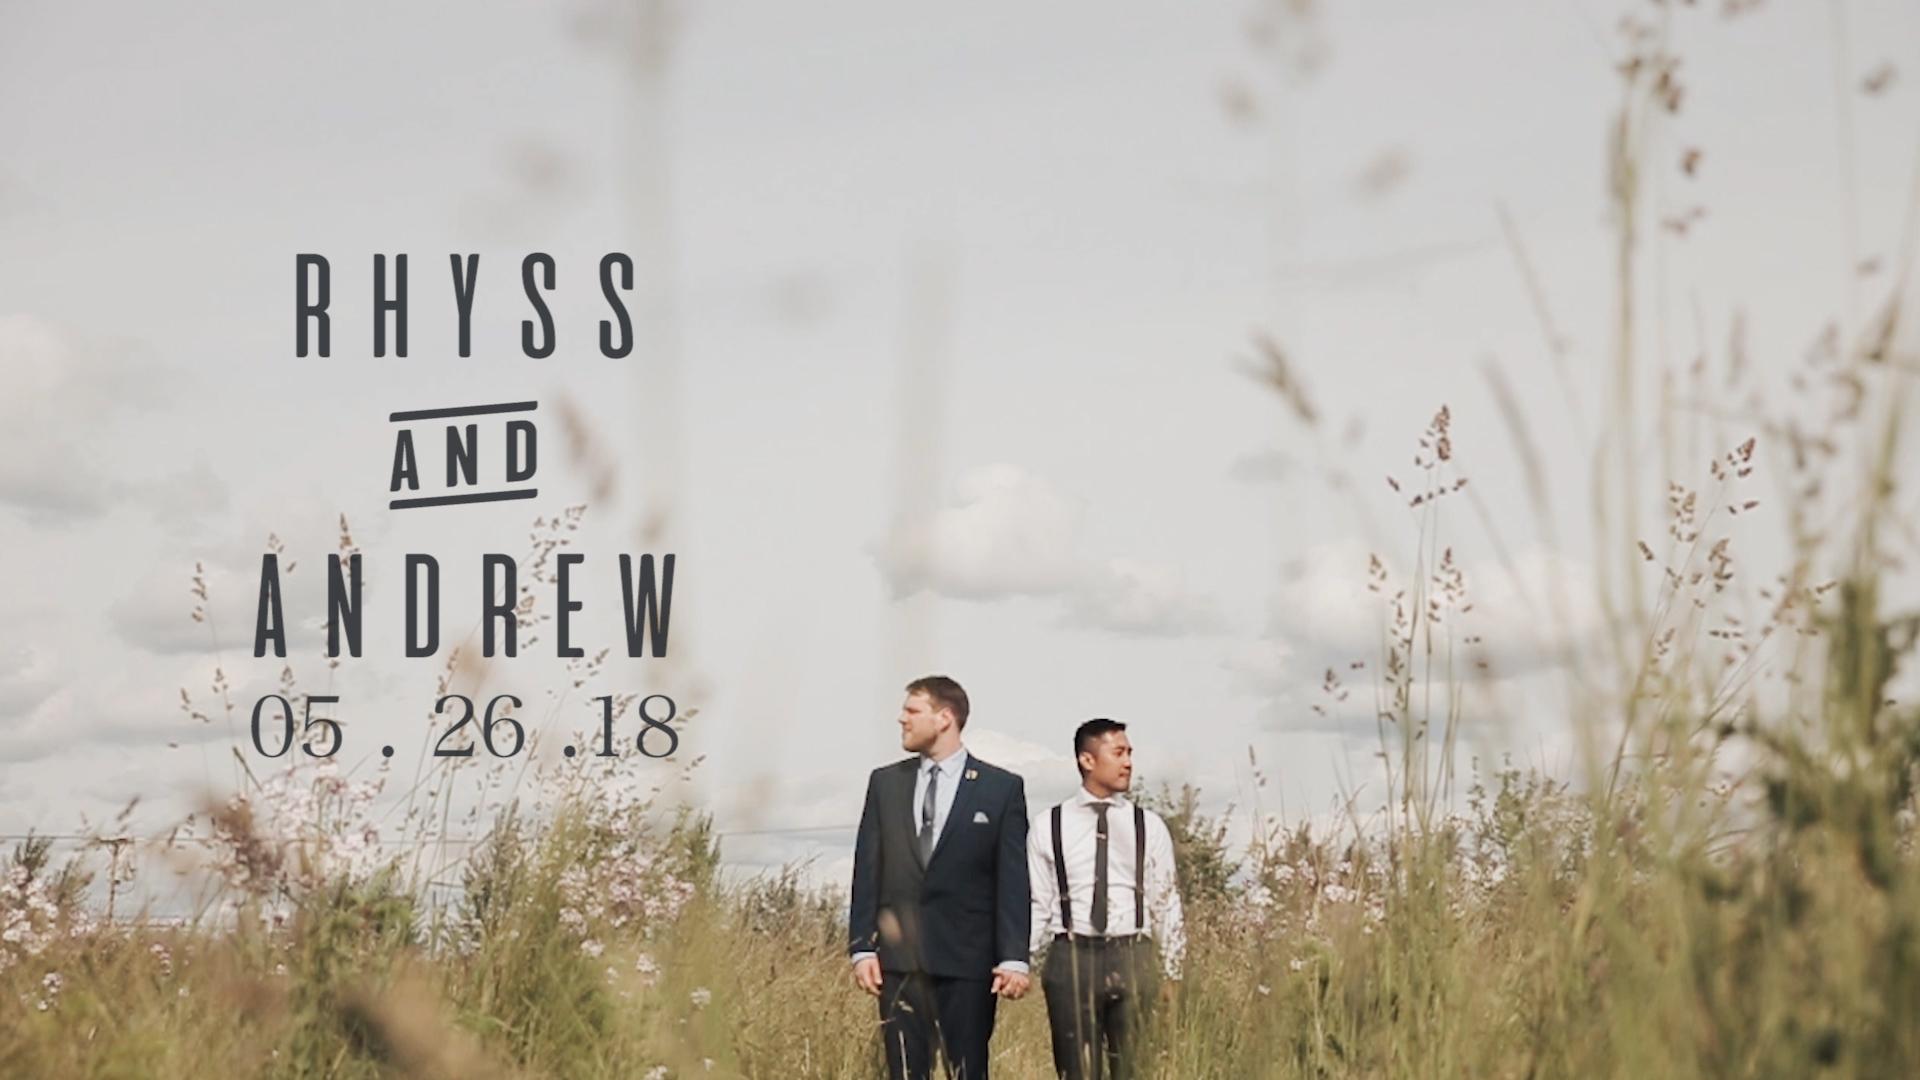 Rhyss + Andrew | Seattle, Washington | Dairyland